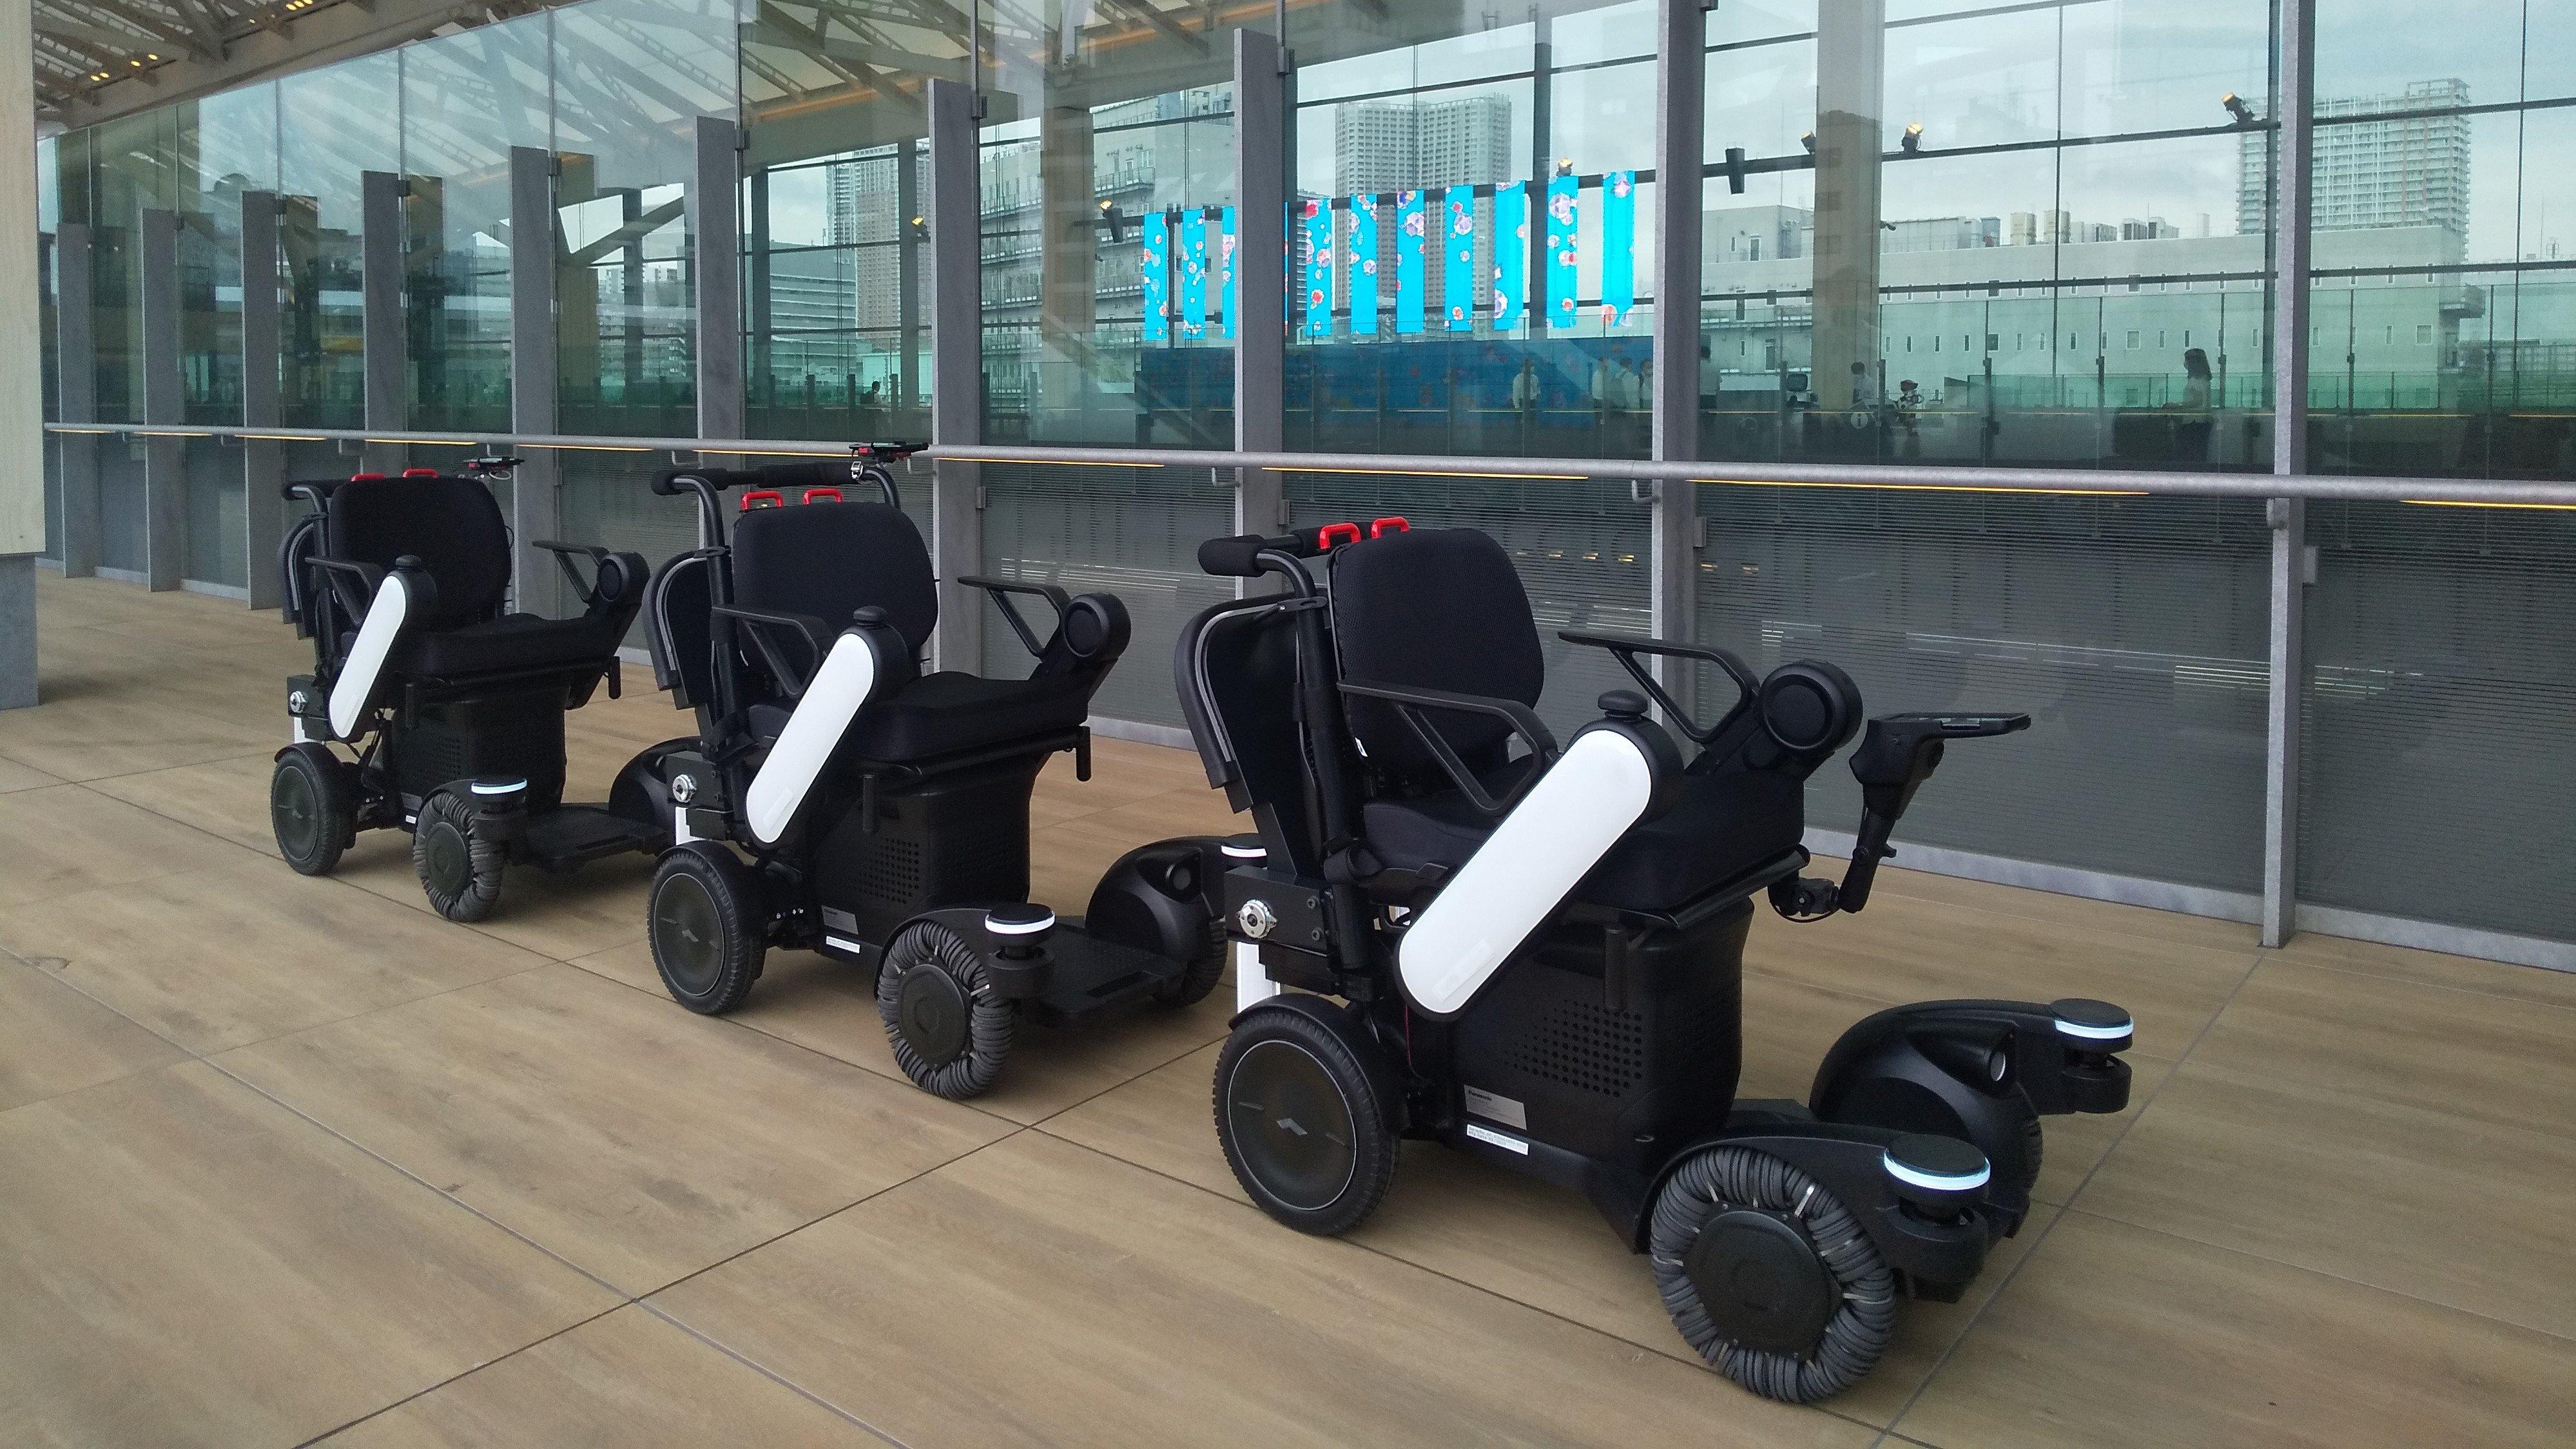 Photo: Autonomous tracking robotic mobility